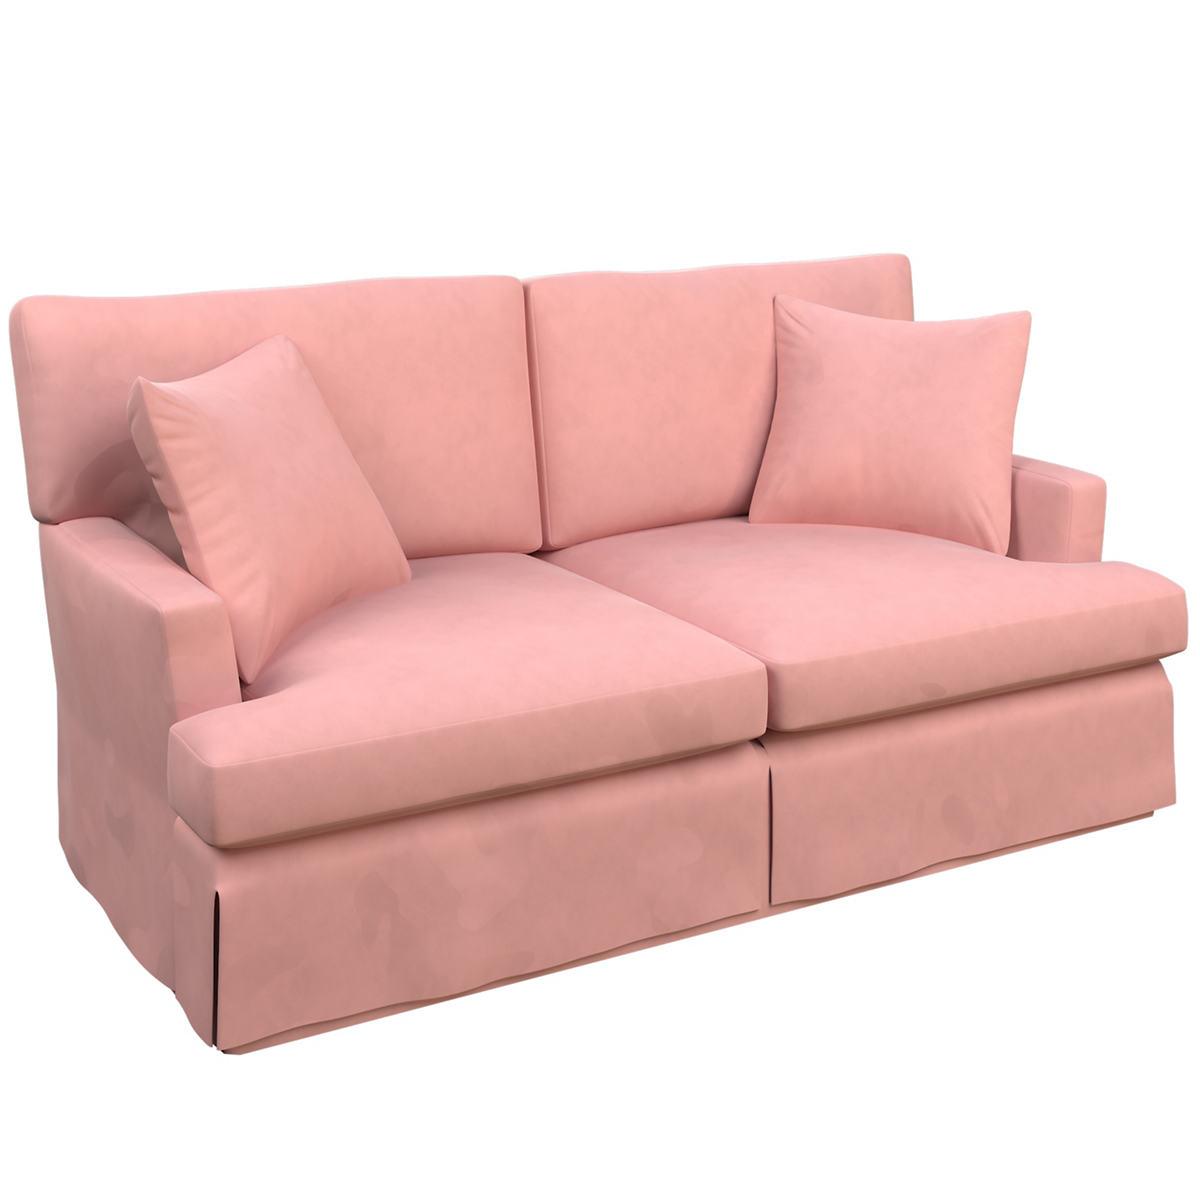 Velvesuede Lavender Rose Saybrook 2 Seater Sofa